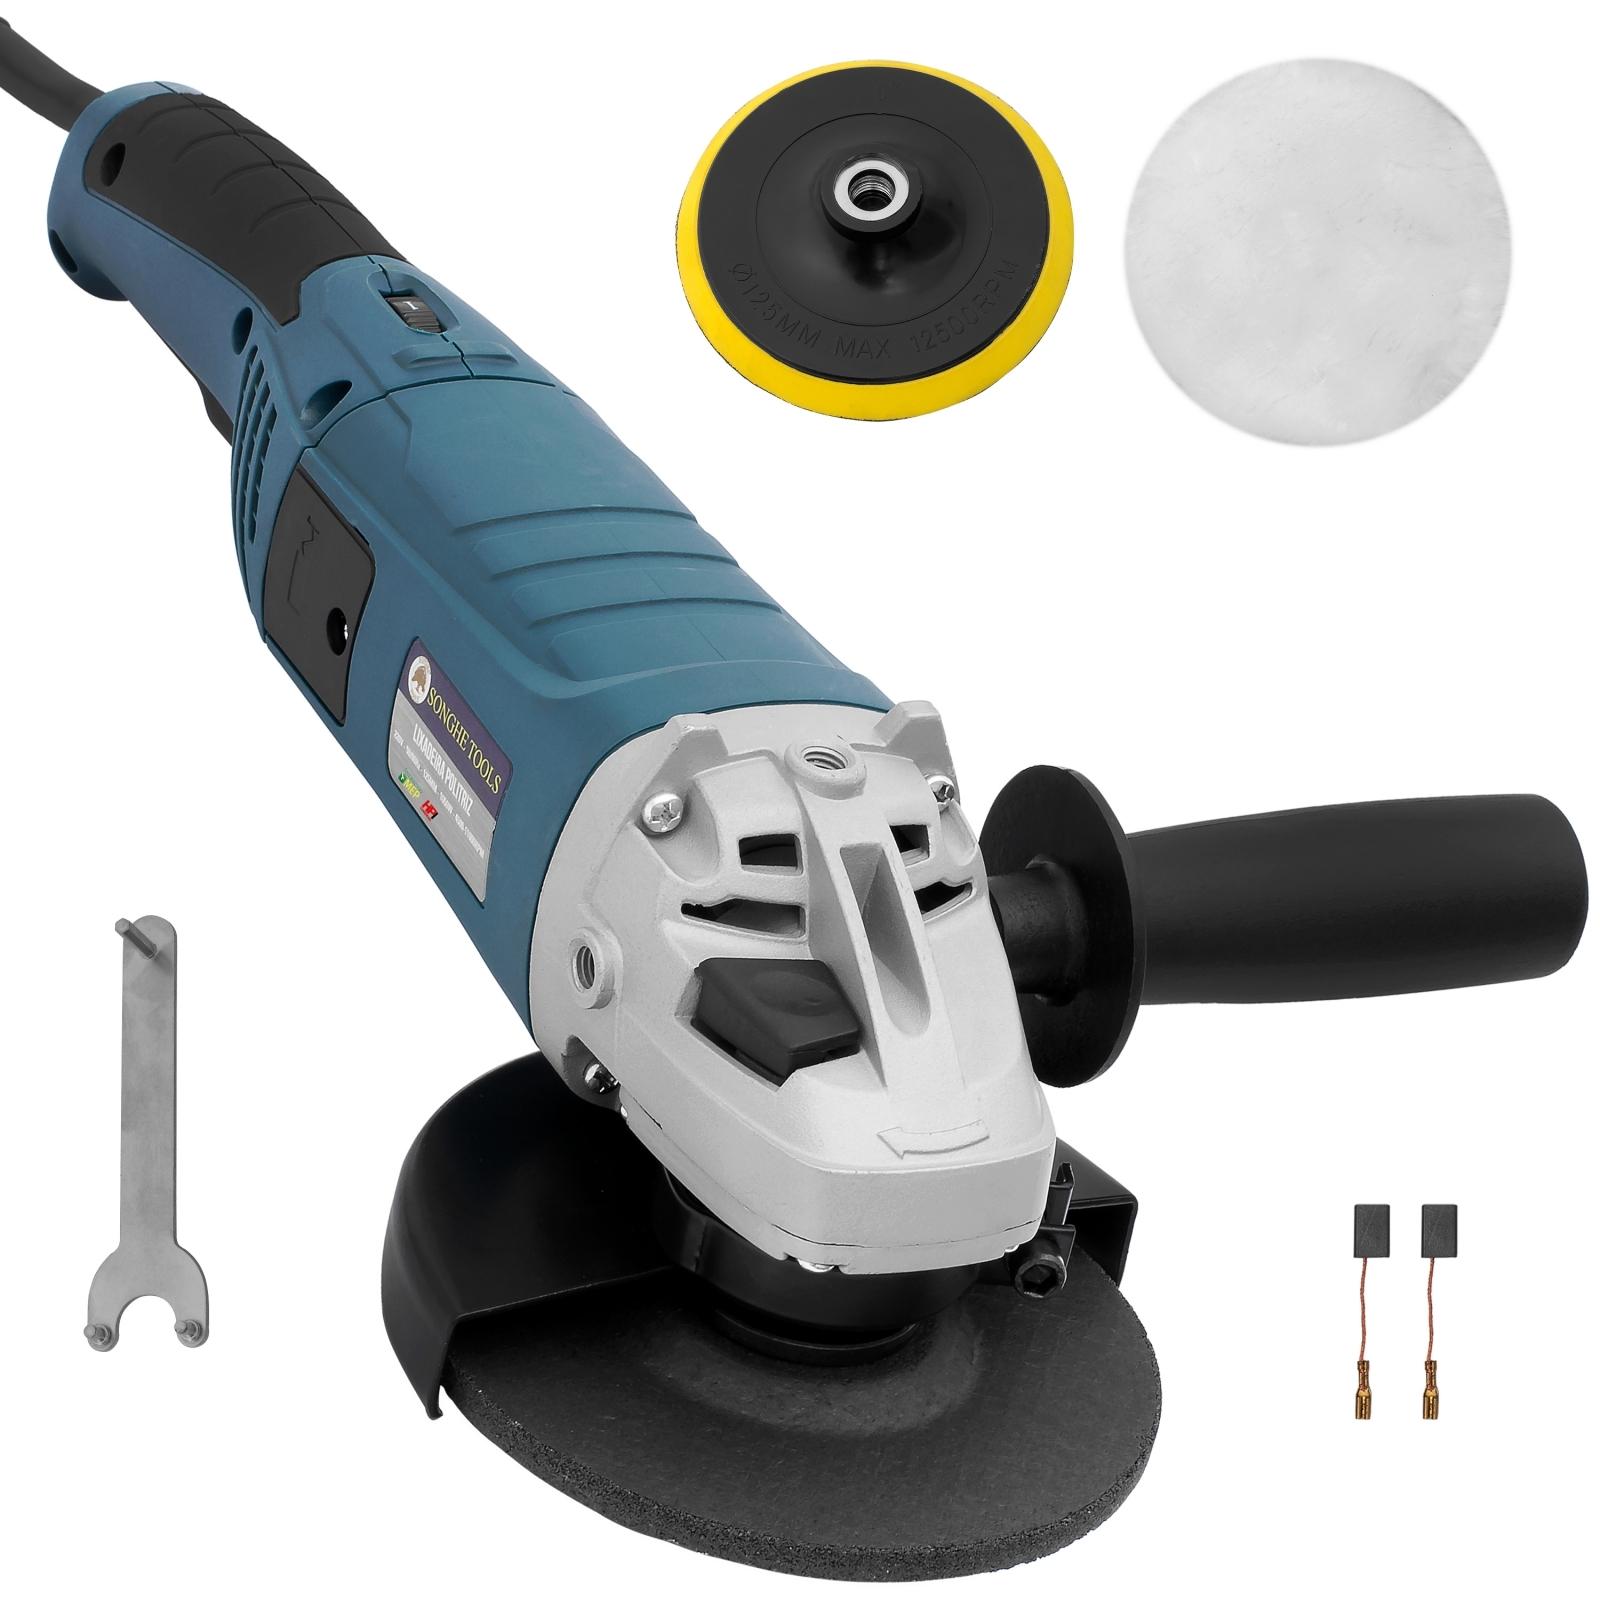 Politriz Lixadeira e Esmerilhadeira Songhe Tools SH 0266 - Ferramentas MEP